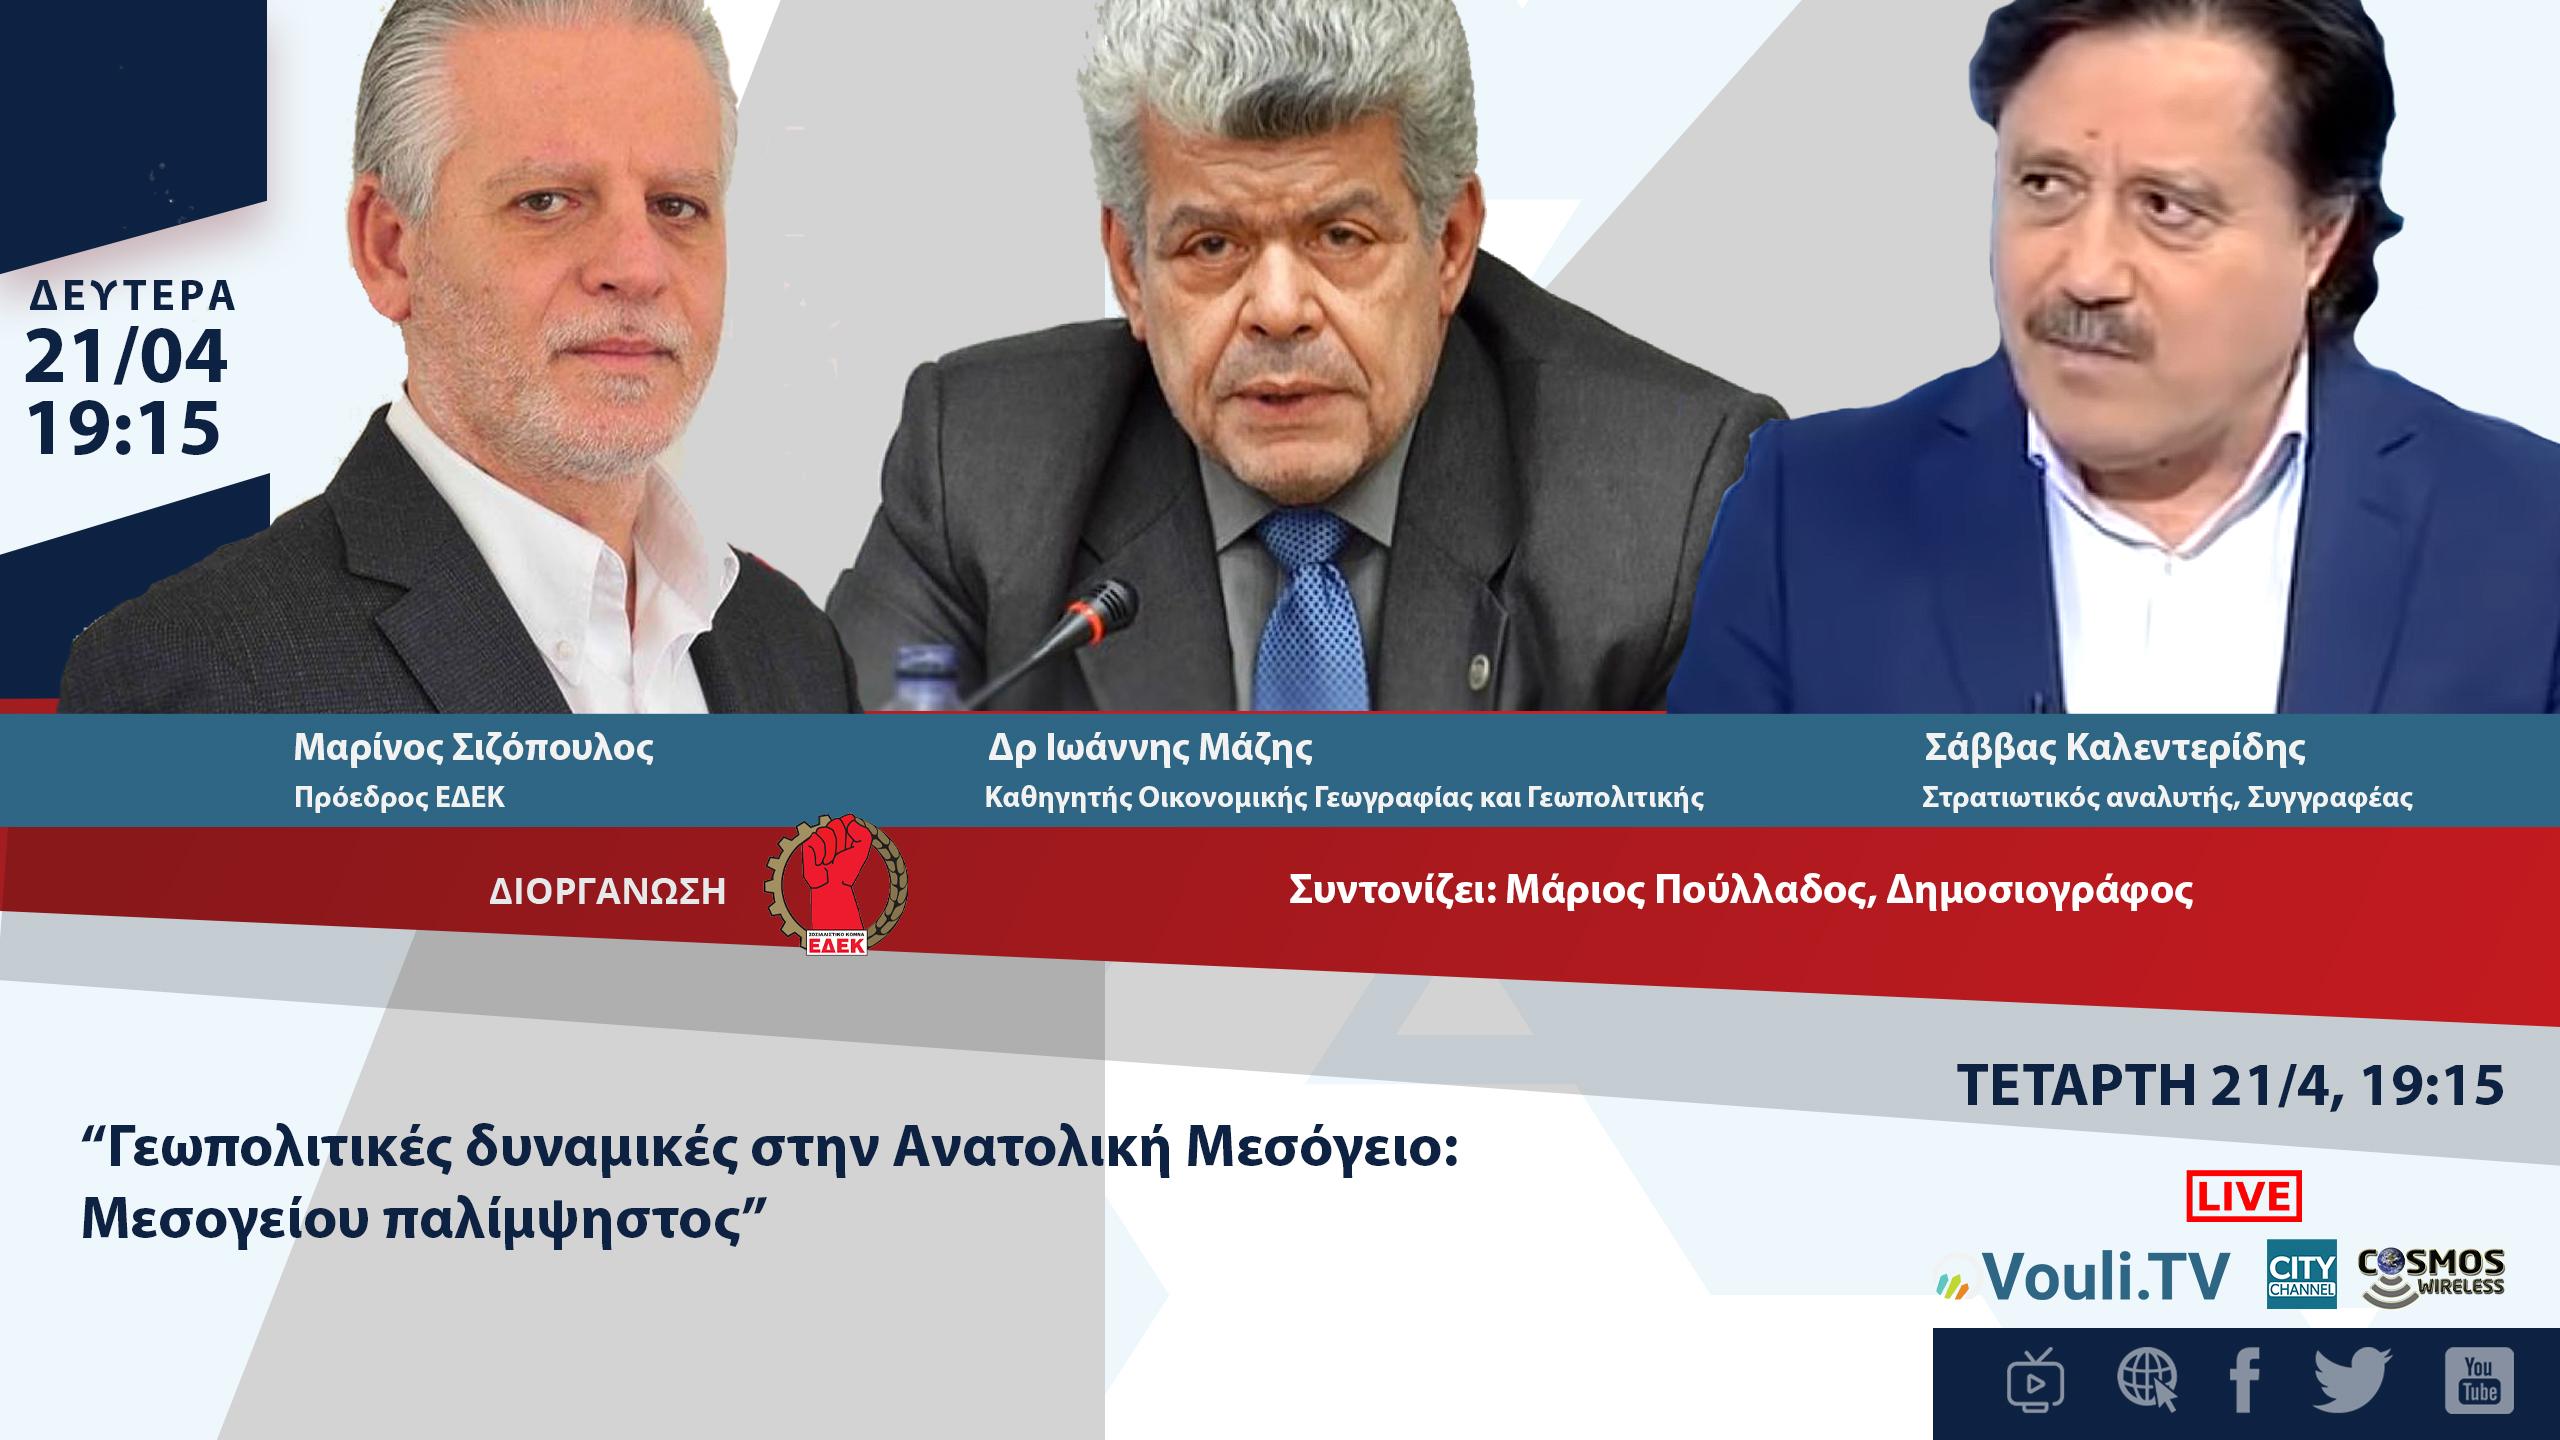 "LIVE ""Γεωπολιτικές δυναμικές στην Aνατολική Μεσόγειο: Μεσογείου παλίμψηστος"""